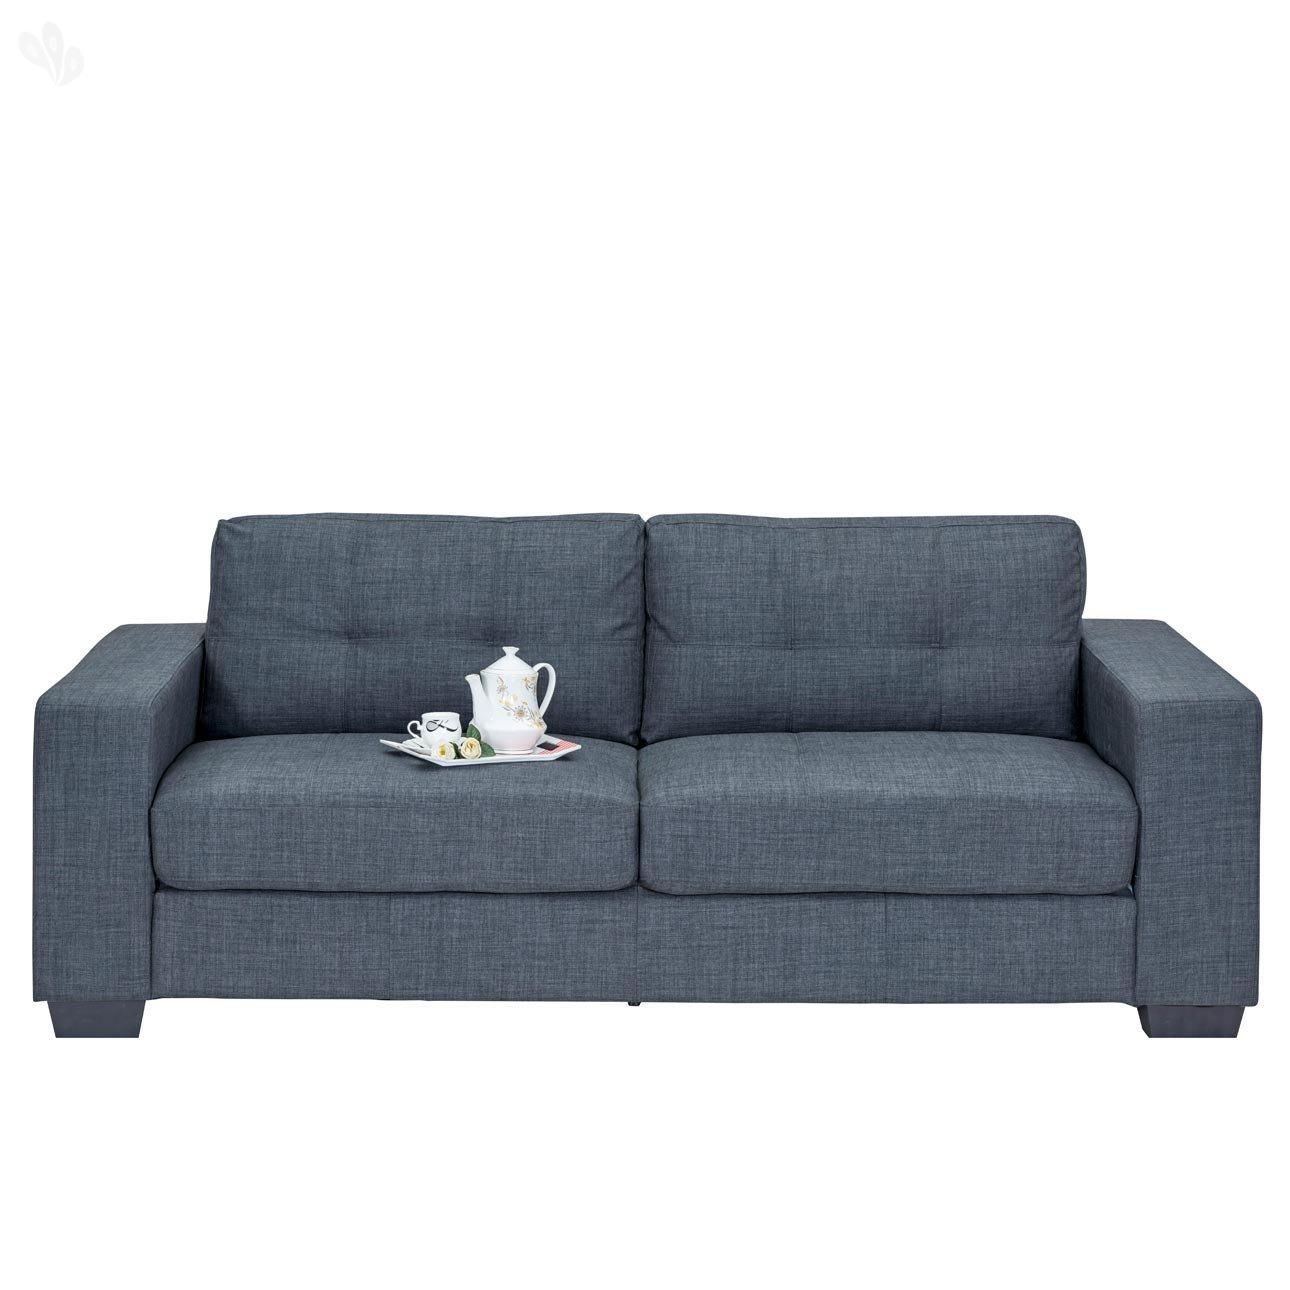 Royal oak berlin three seater sofa grey amazon home kitchen parisarafo Choice Image